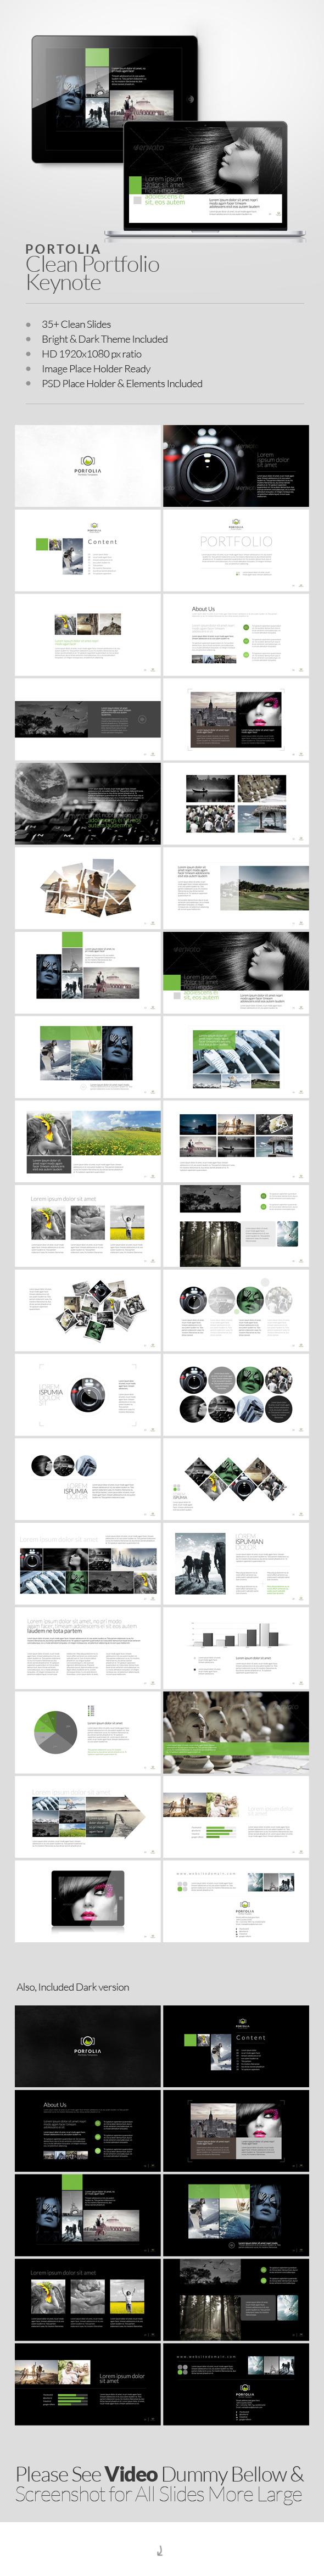 Portolia Multipurpose Clean Portfolio Keynote